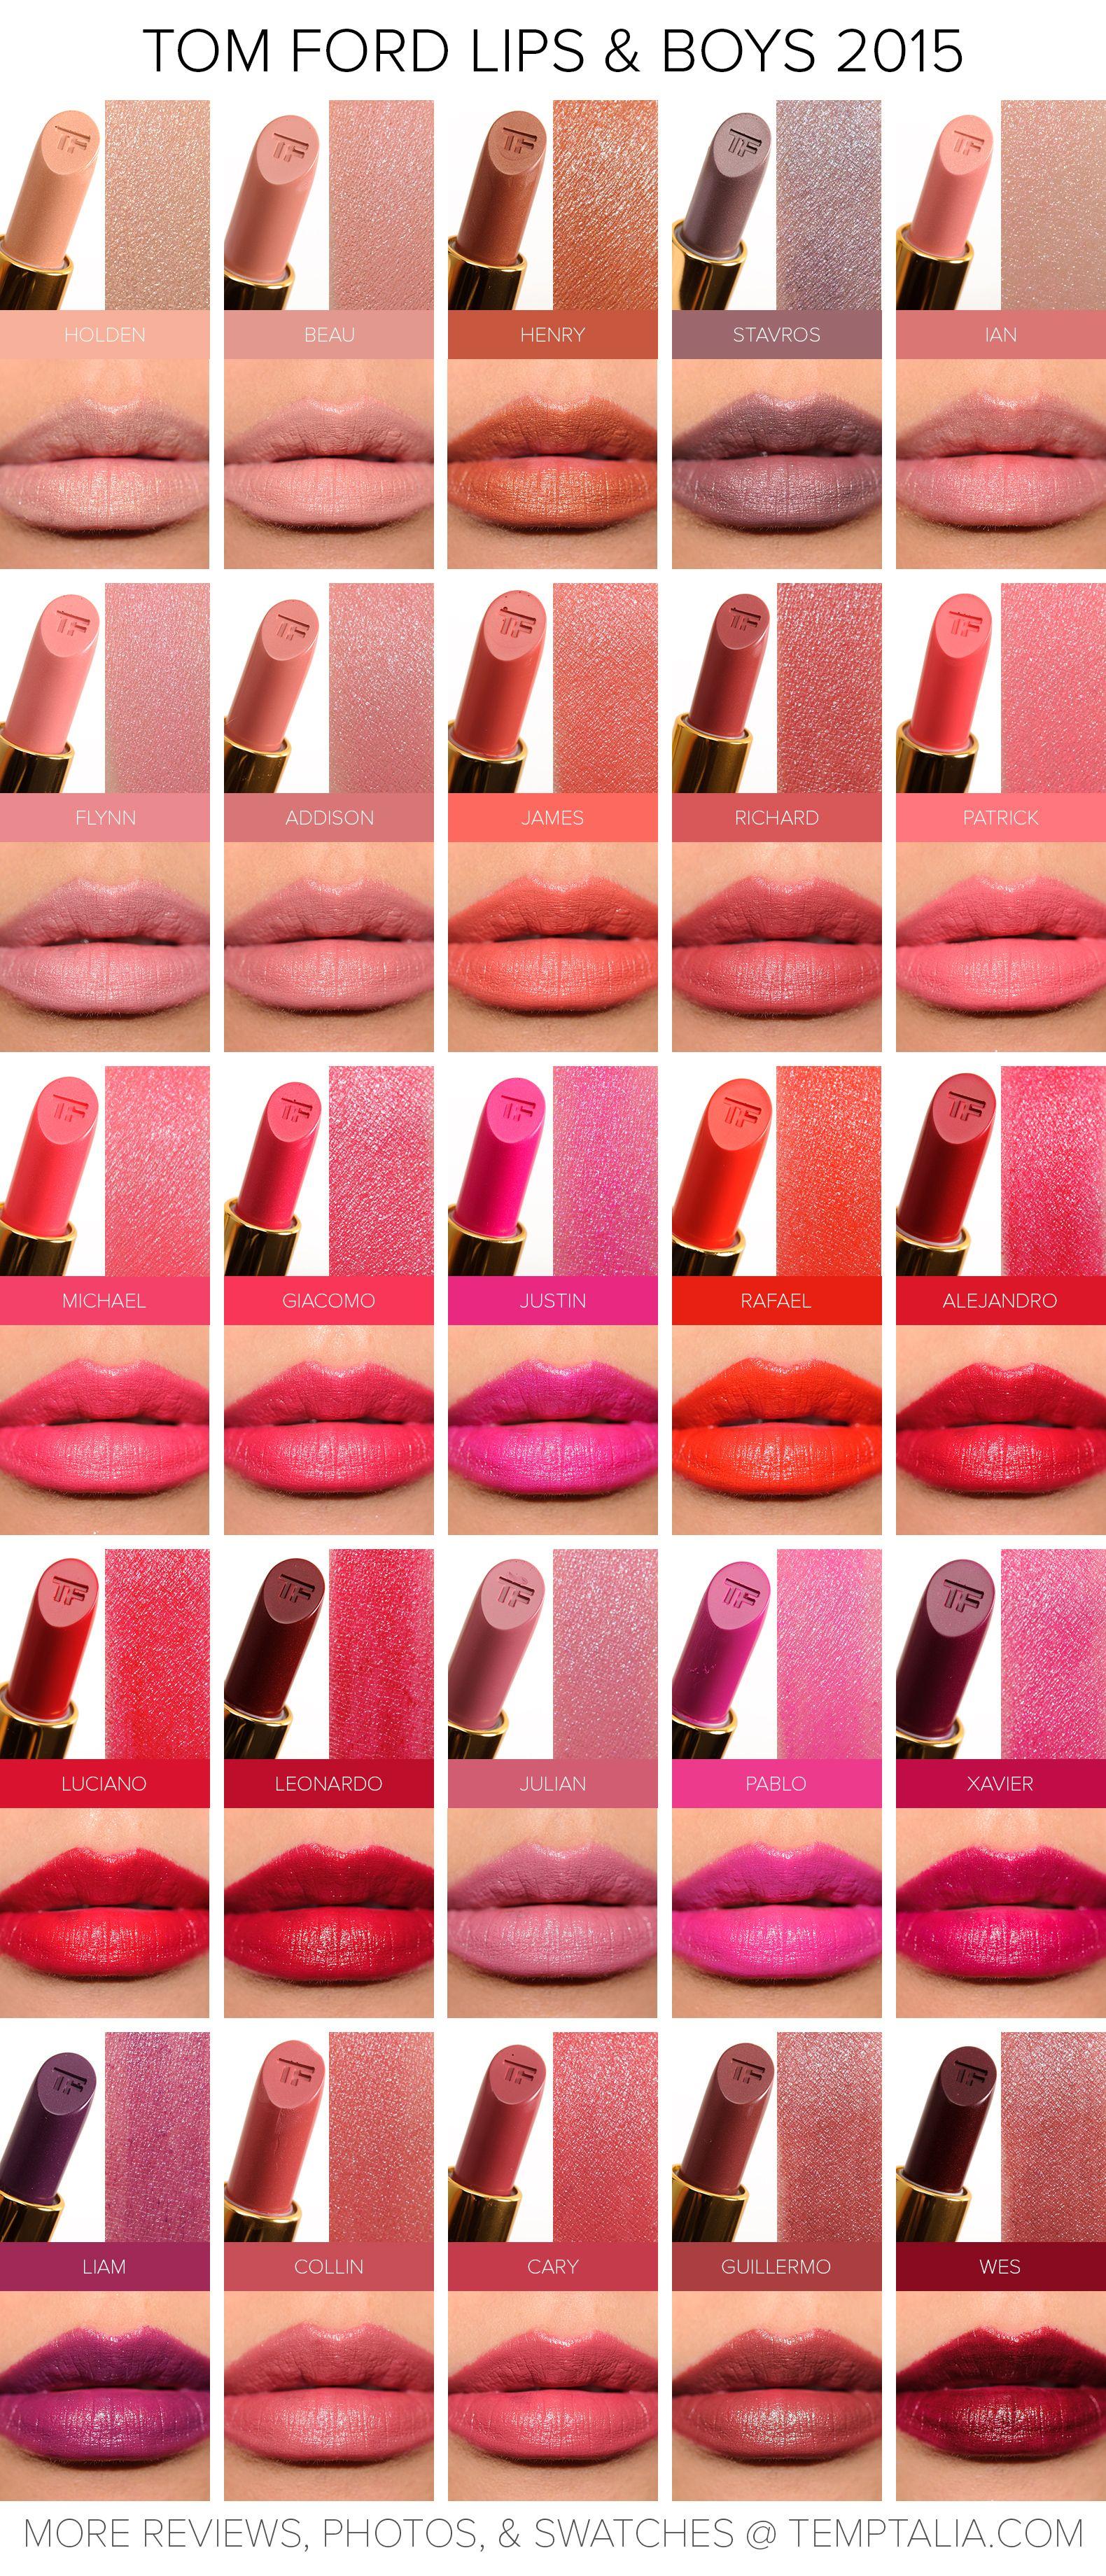 Swatches Of Colourpop Martian Helium And Utopia Tie Dye: Sneak Peek: Tom Ford Lips & Boys 2015 Swatches & Photos